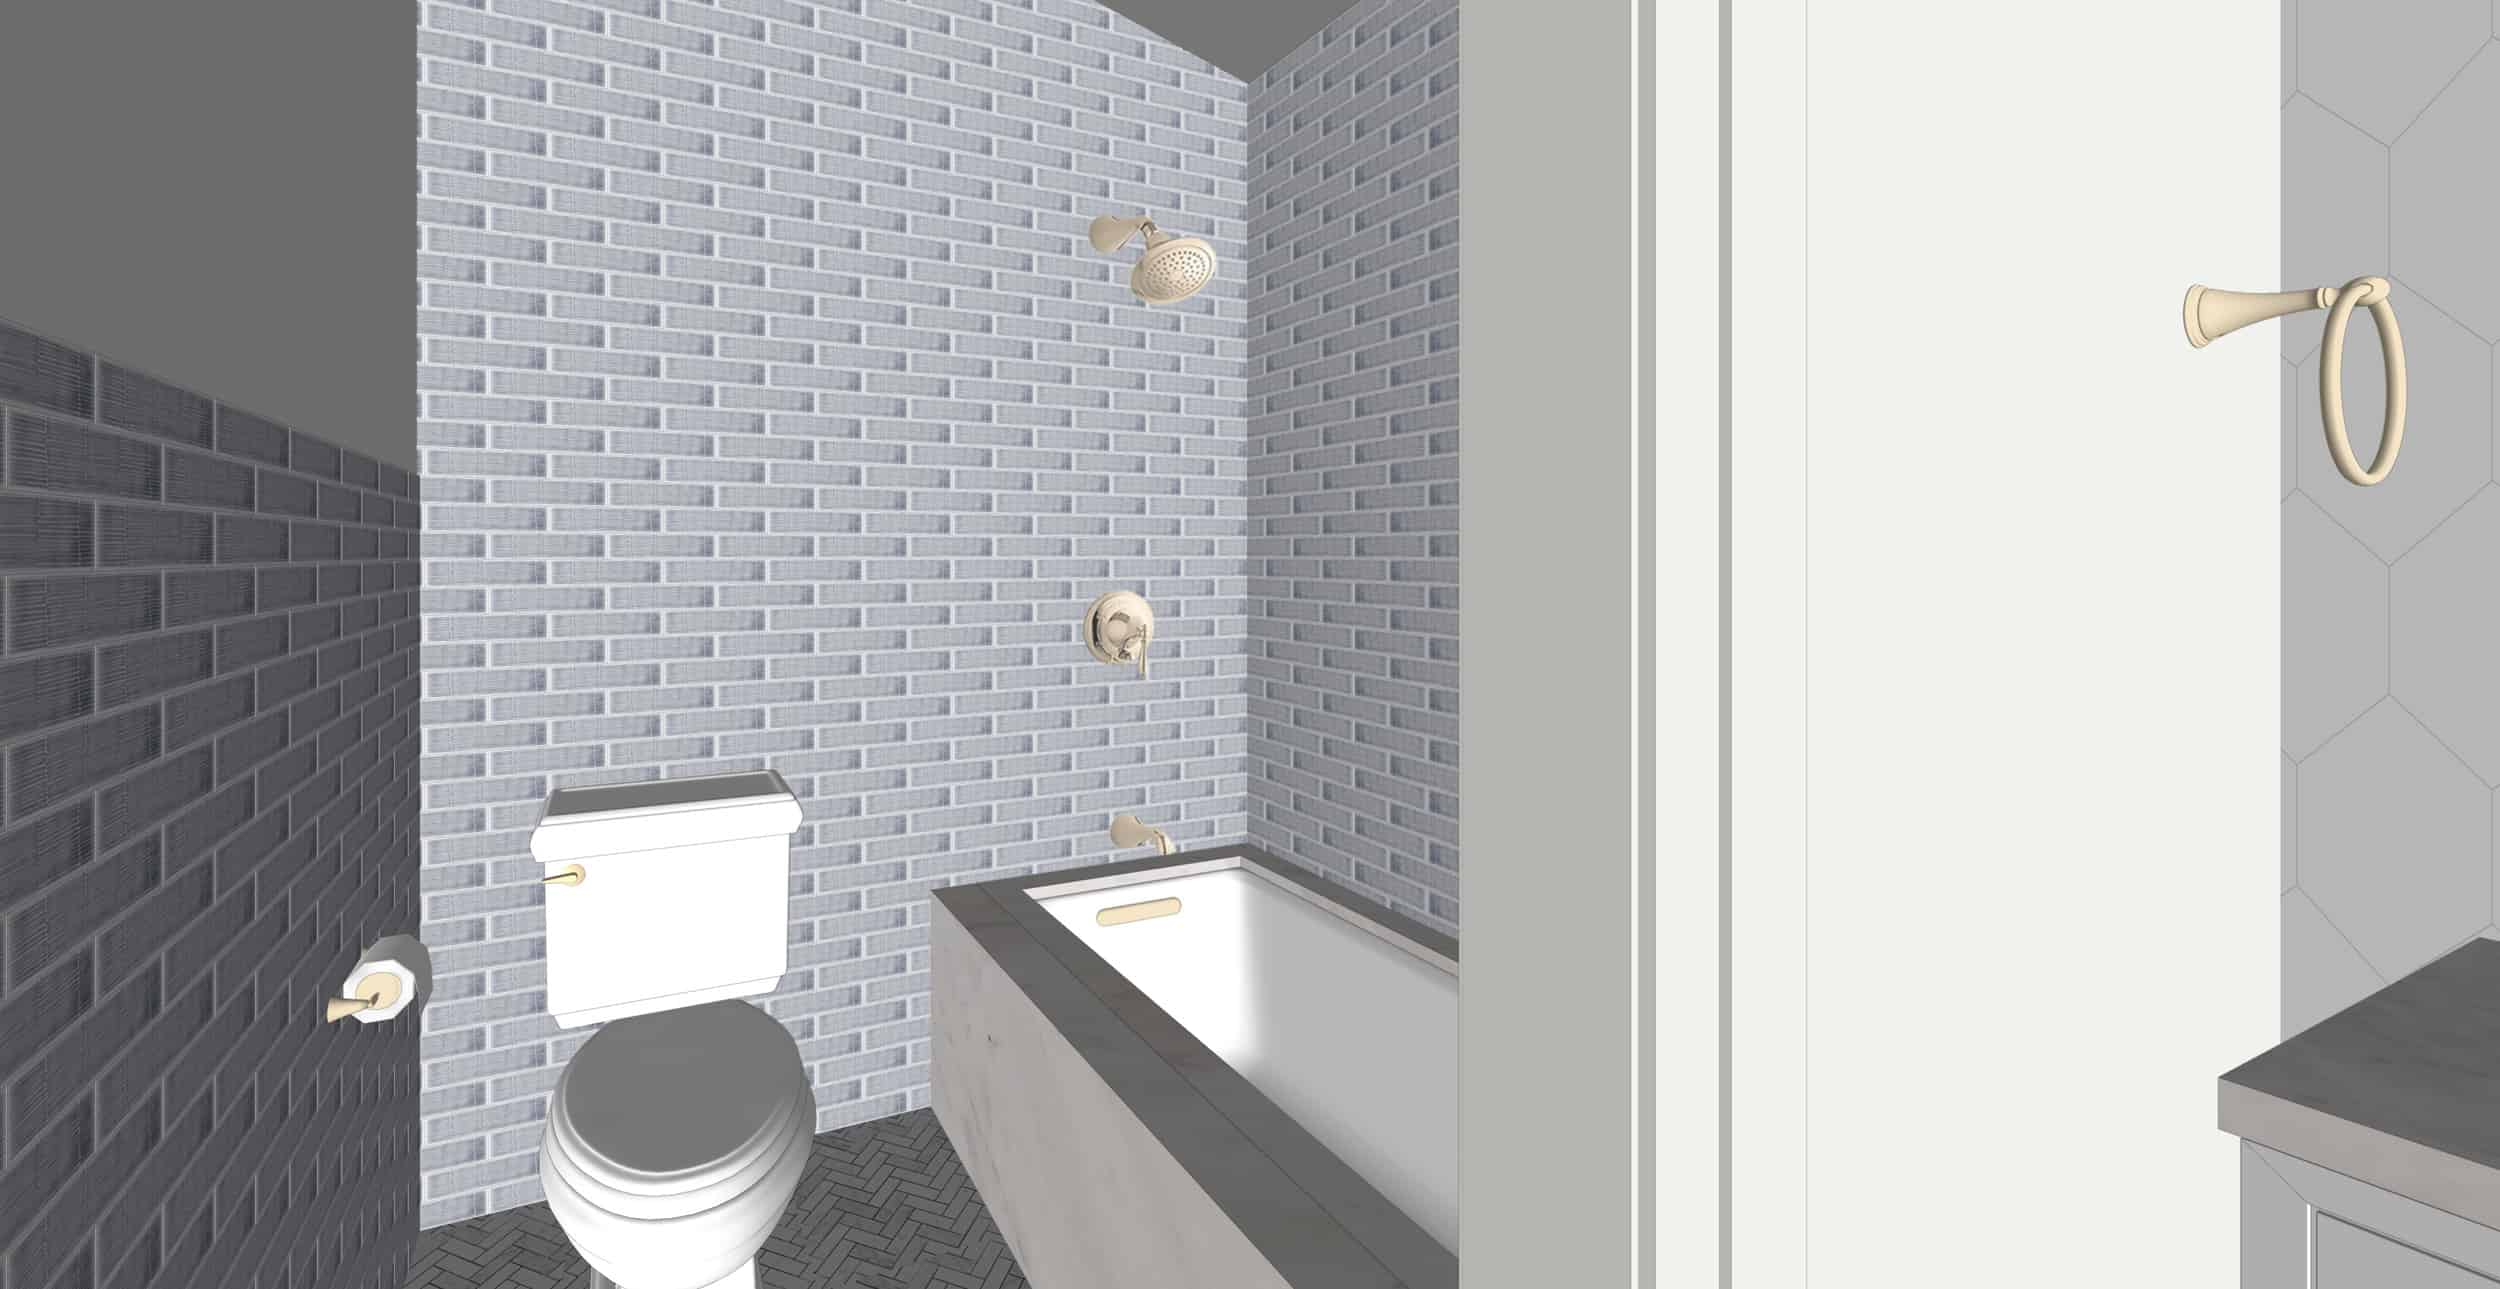 Emily Henderson Portland Fixer Upper Hall Bath Kids Toilet And Shower Render 7.31.18